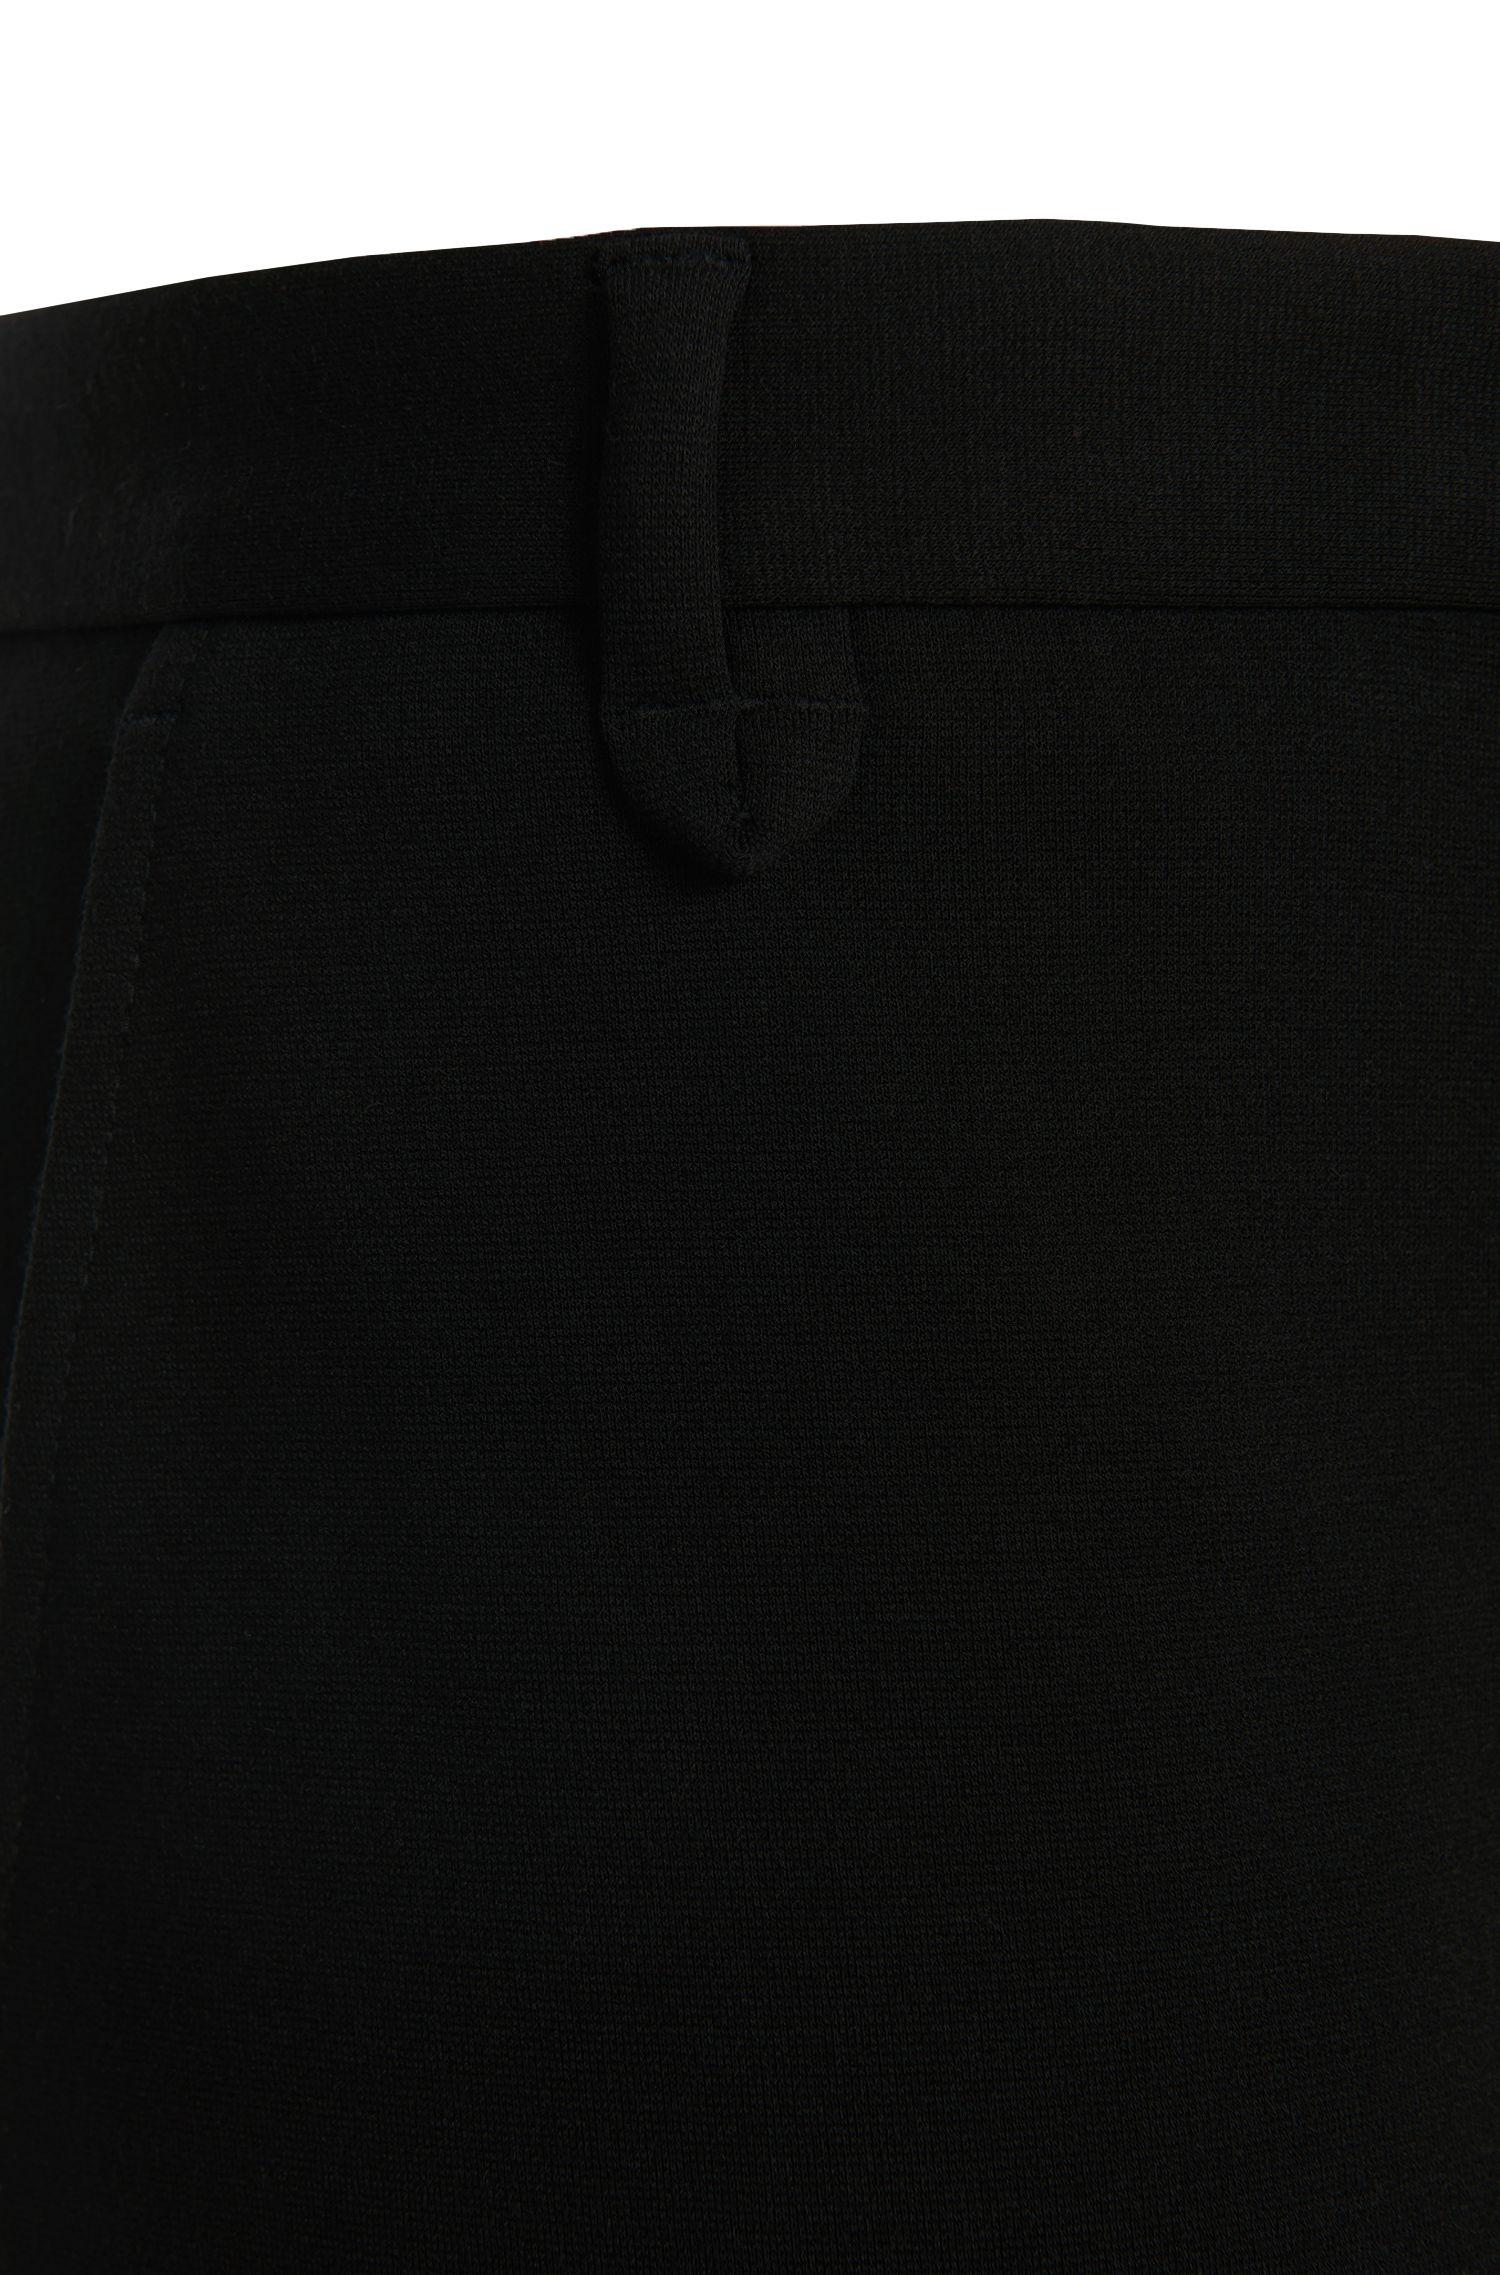 Pantalon extra Slim Fit en viscose mélangée: «Heldor1»